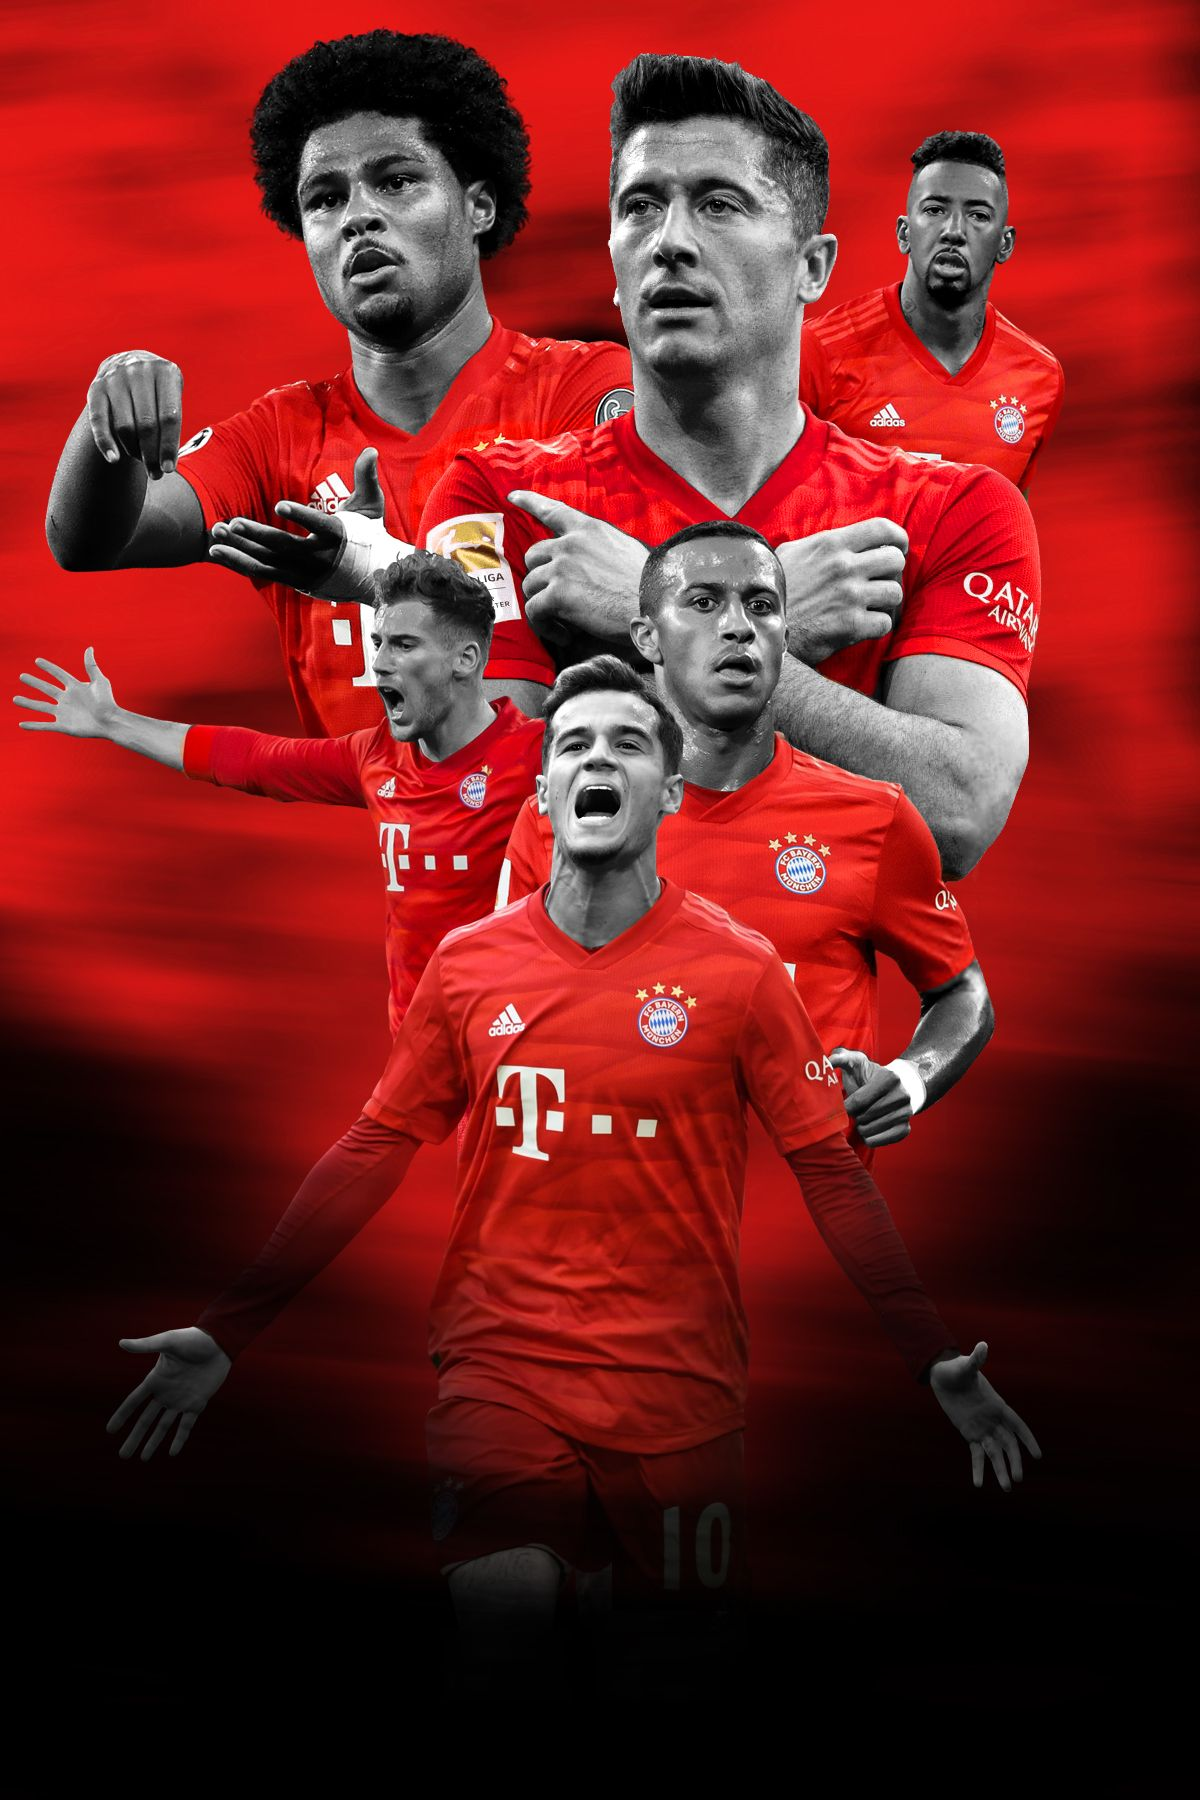 Barcelona Vs Bayern Munich Live Streaming Champions League Watch Live Football Match Online Sonyliv Jio Tv Foot Live Football Match Bayern Munich Soccer Tv